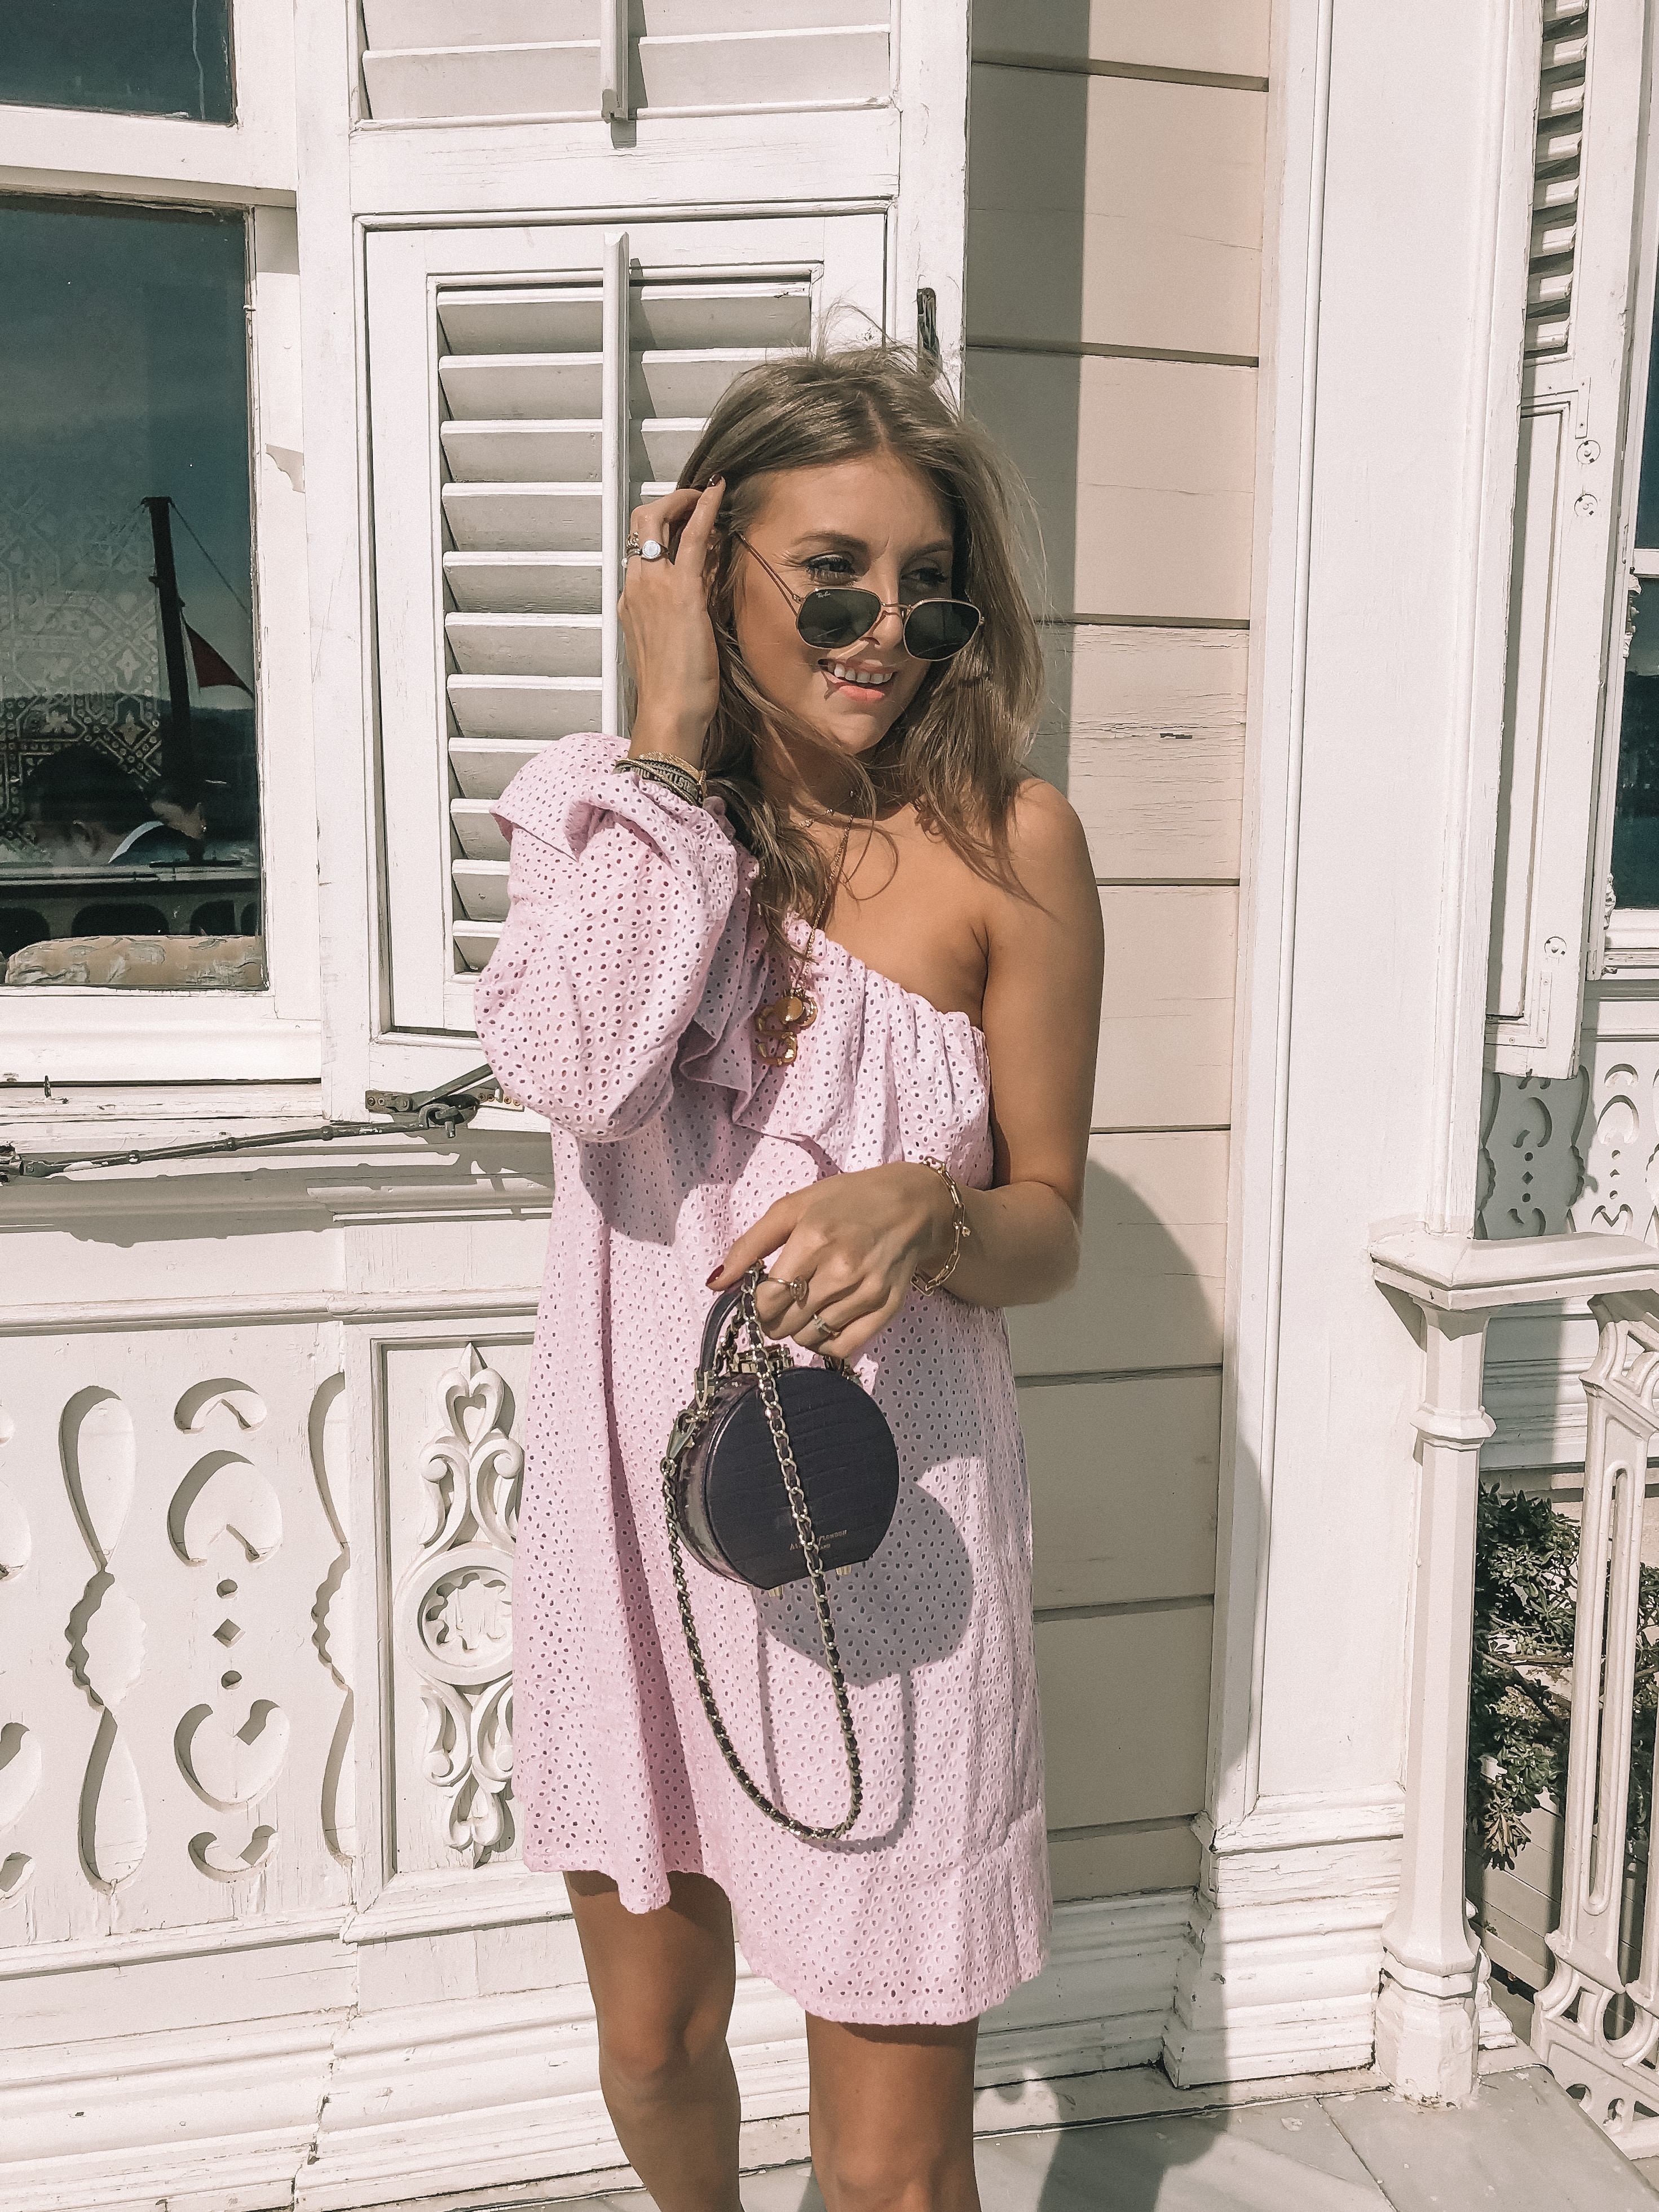 Vero Moda Istanbul - Outfit Diaries - Vero Moda Pink Dress